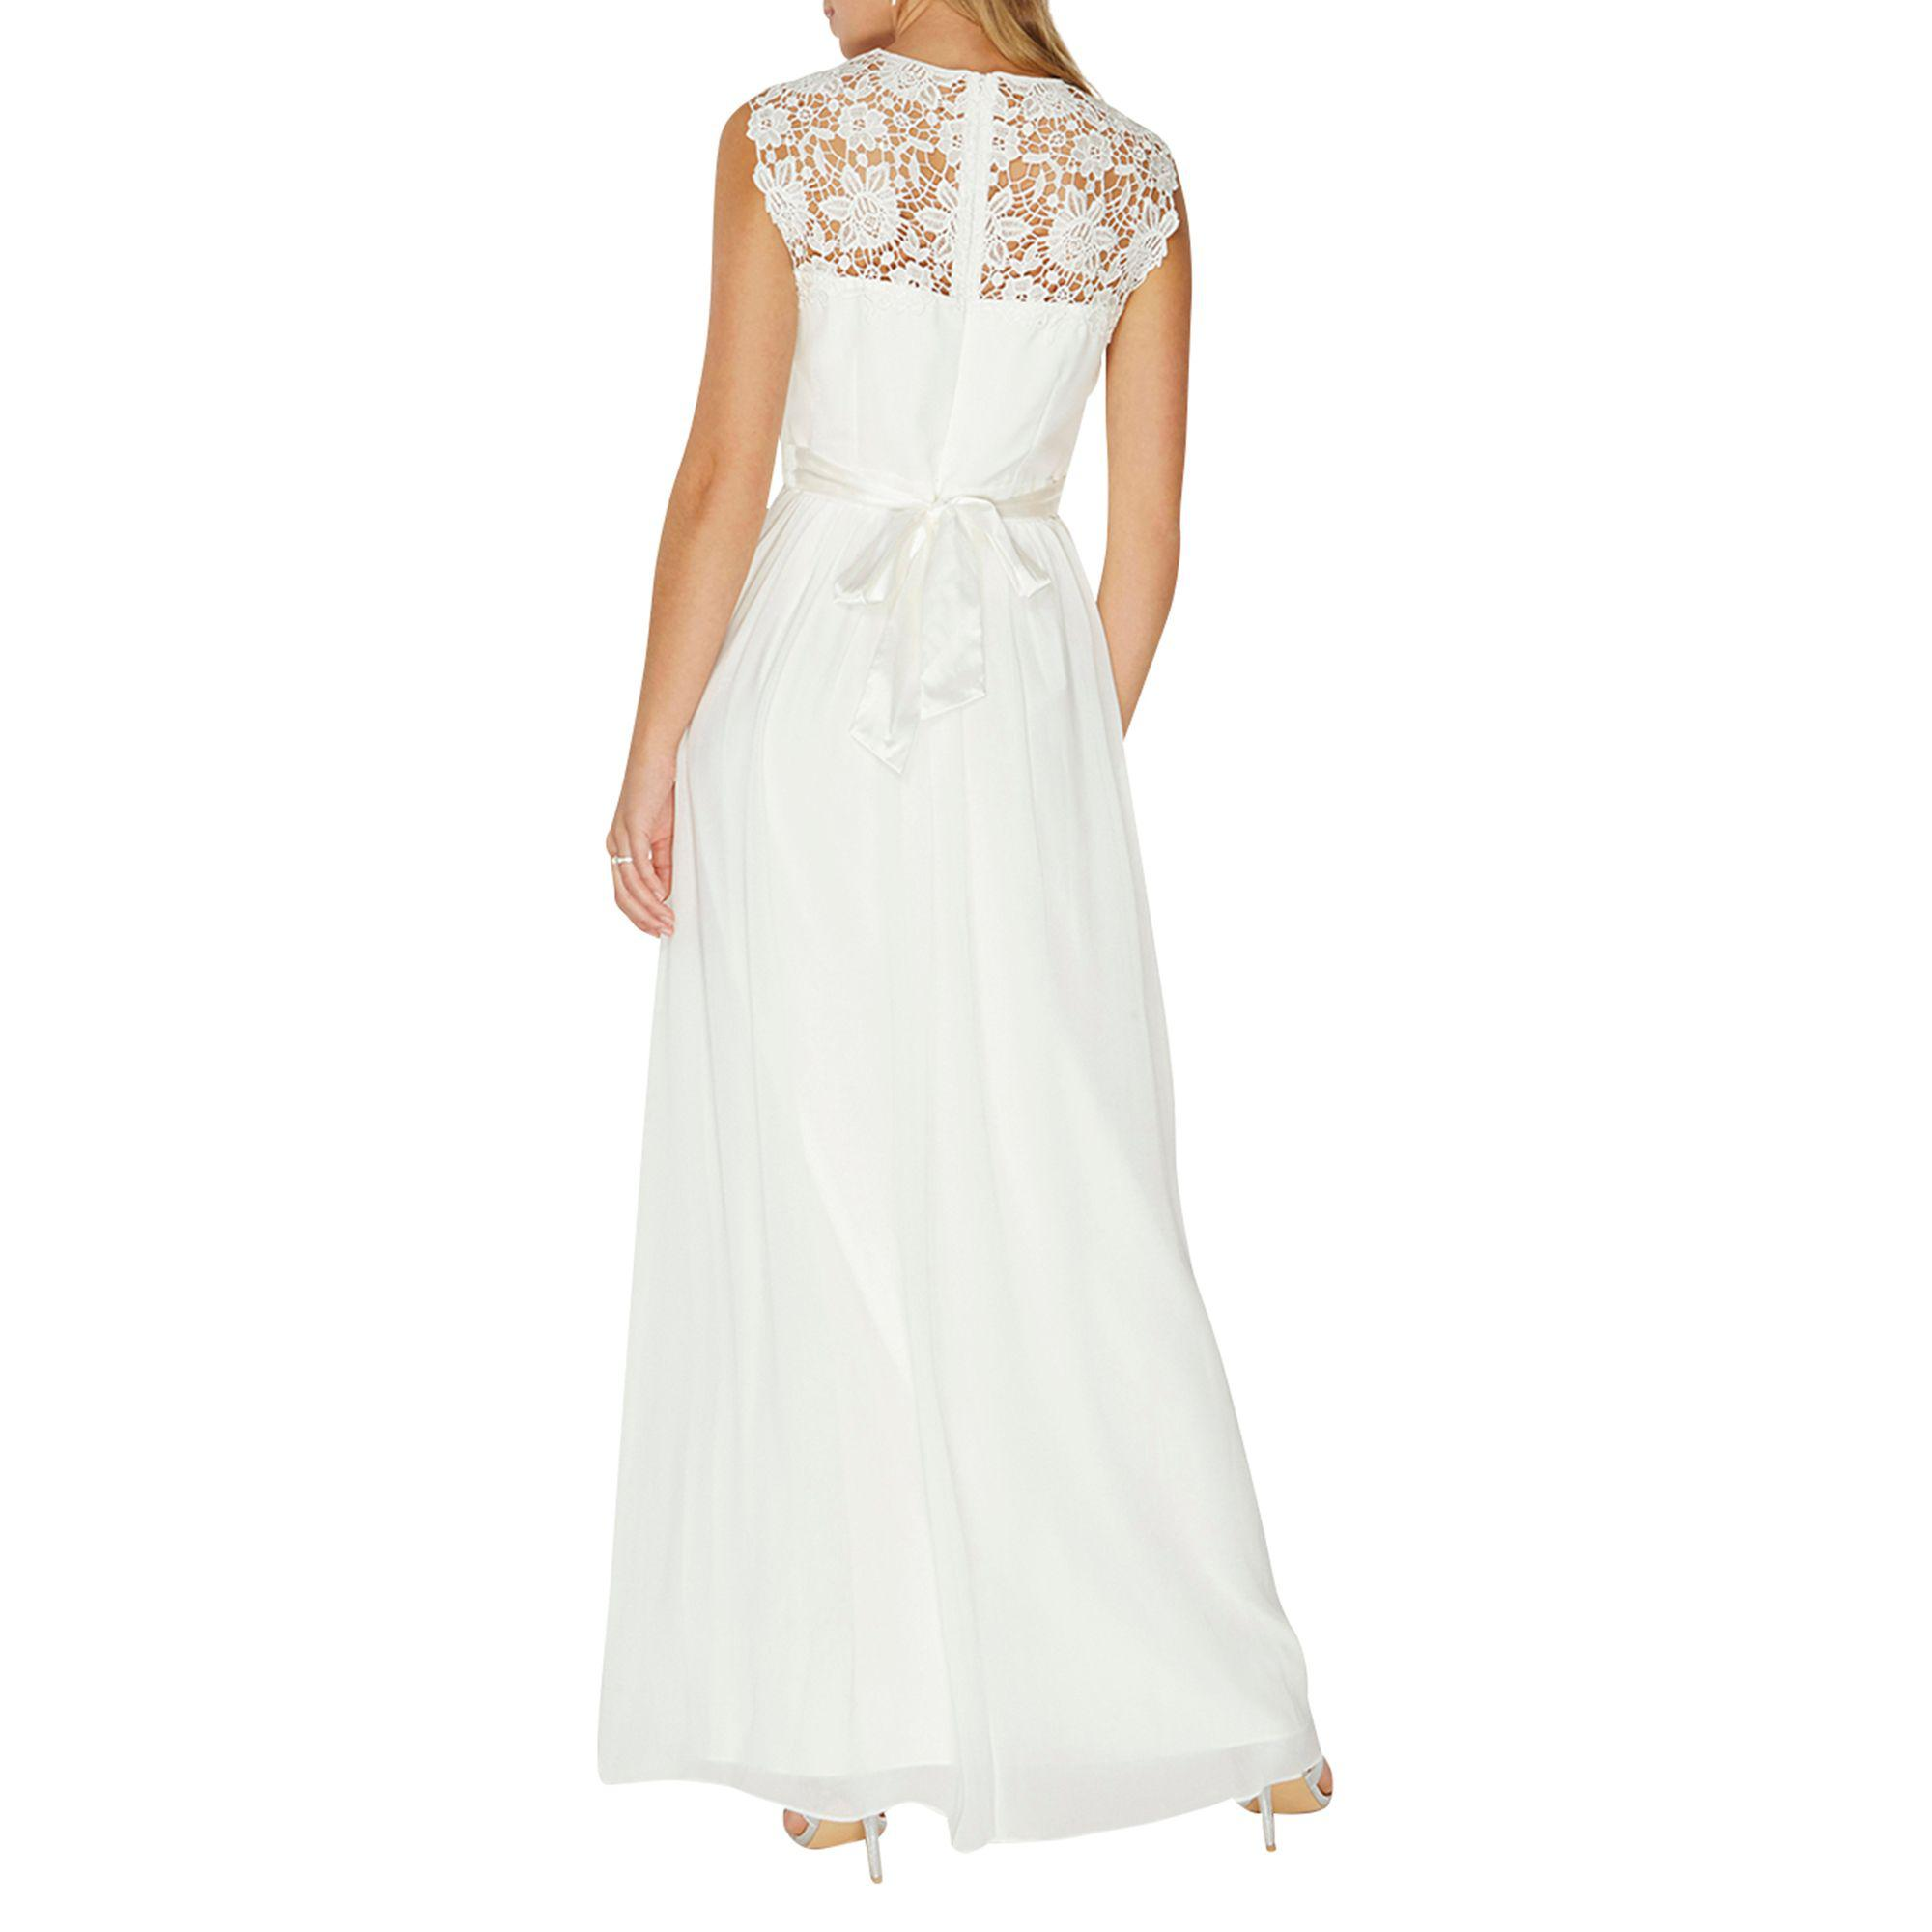 3bbab3eaa01 Dorothy Perkins Bridal  kathryn  Maxi Dress in White - Lyst